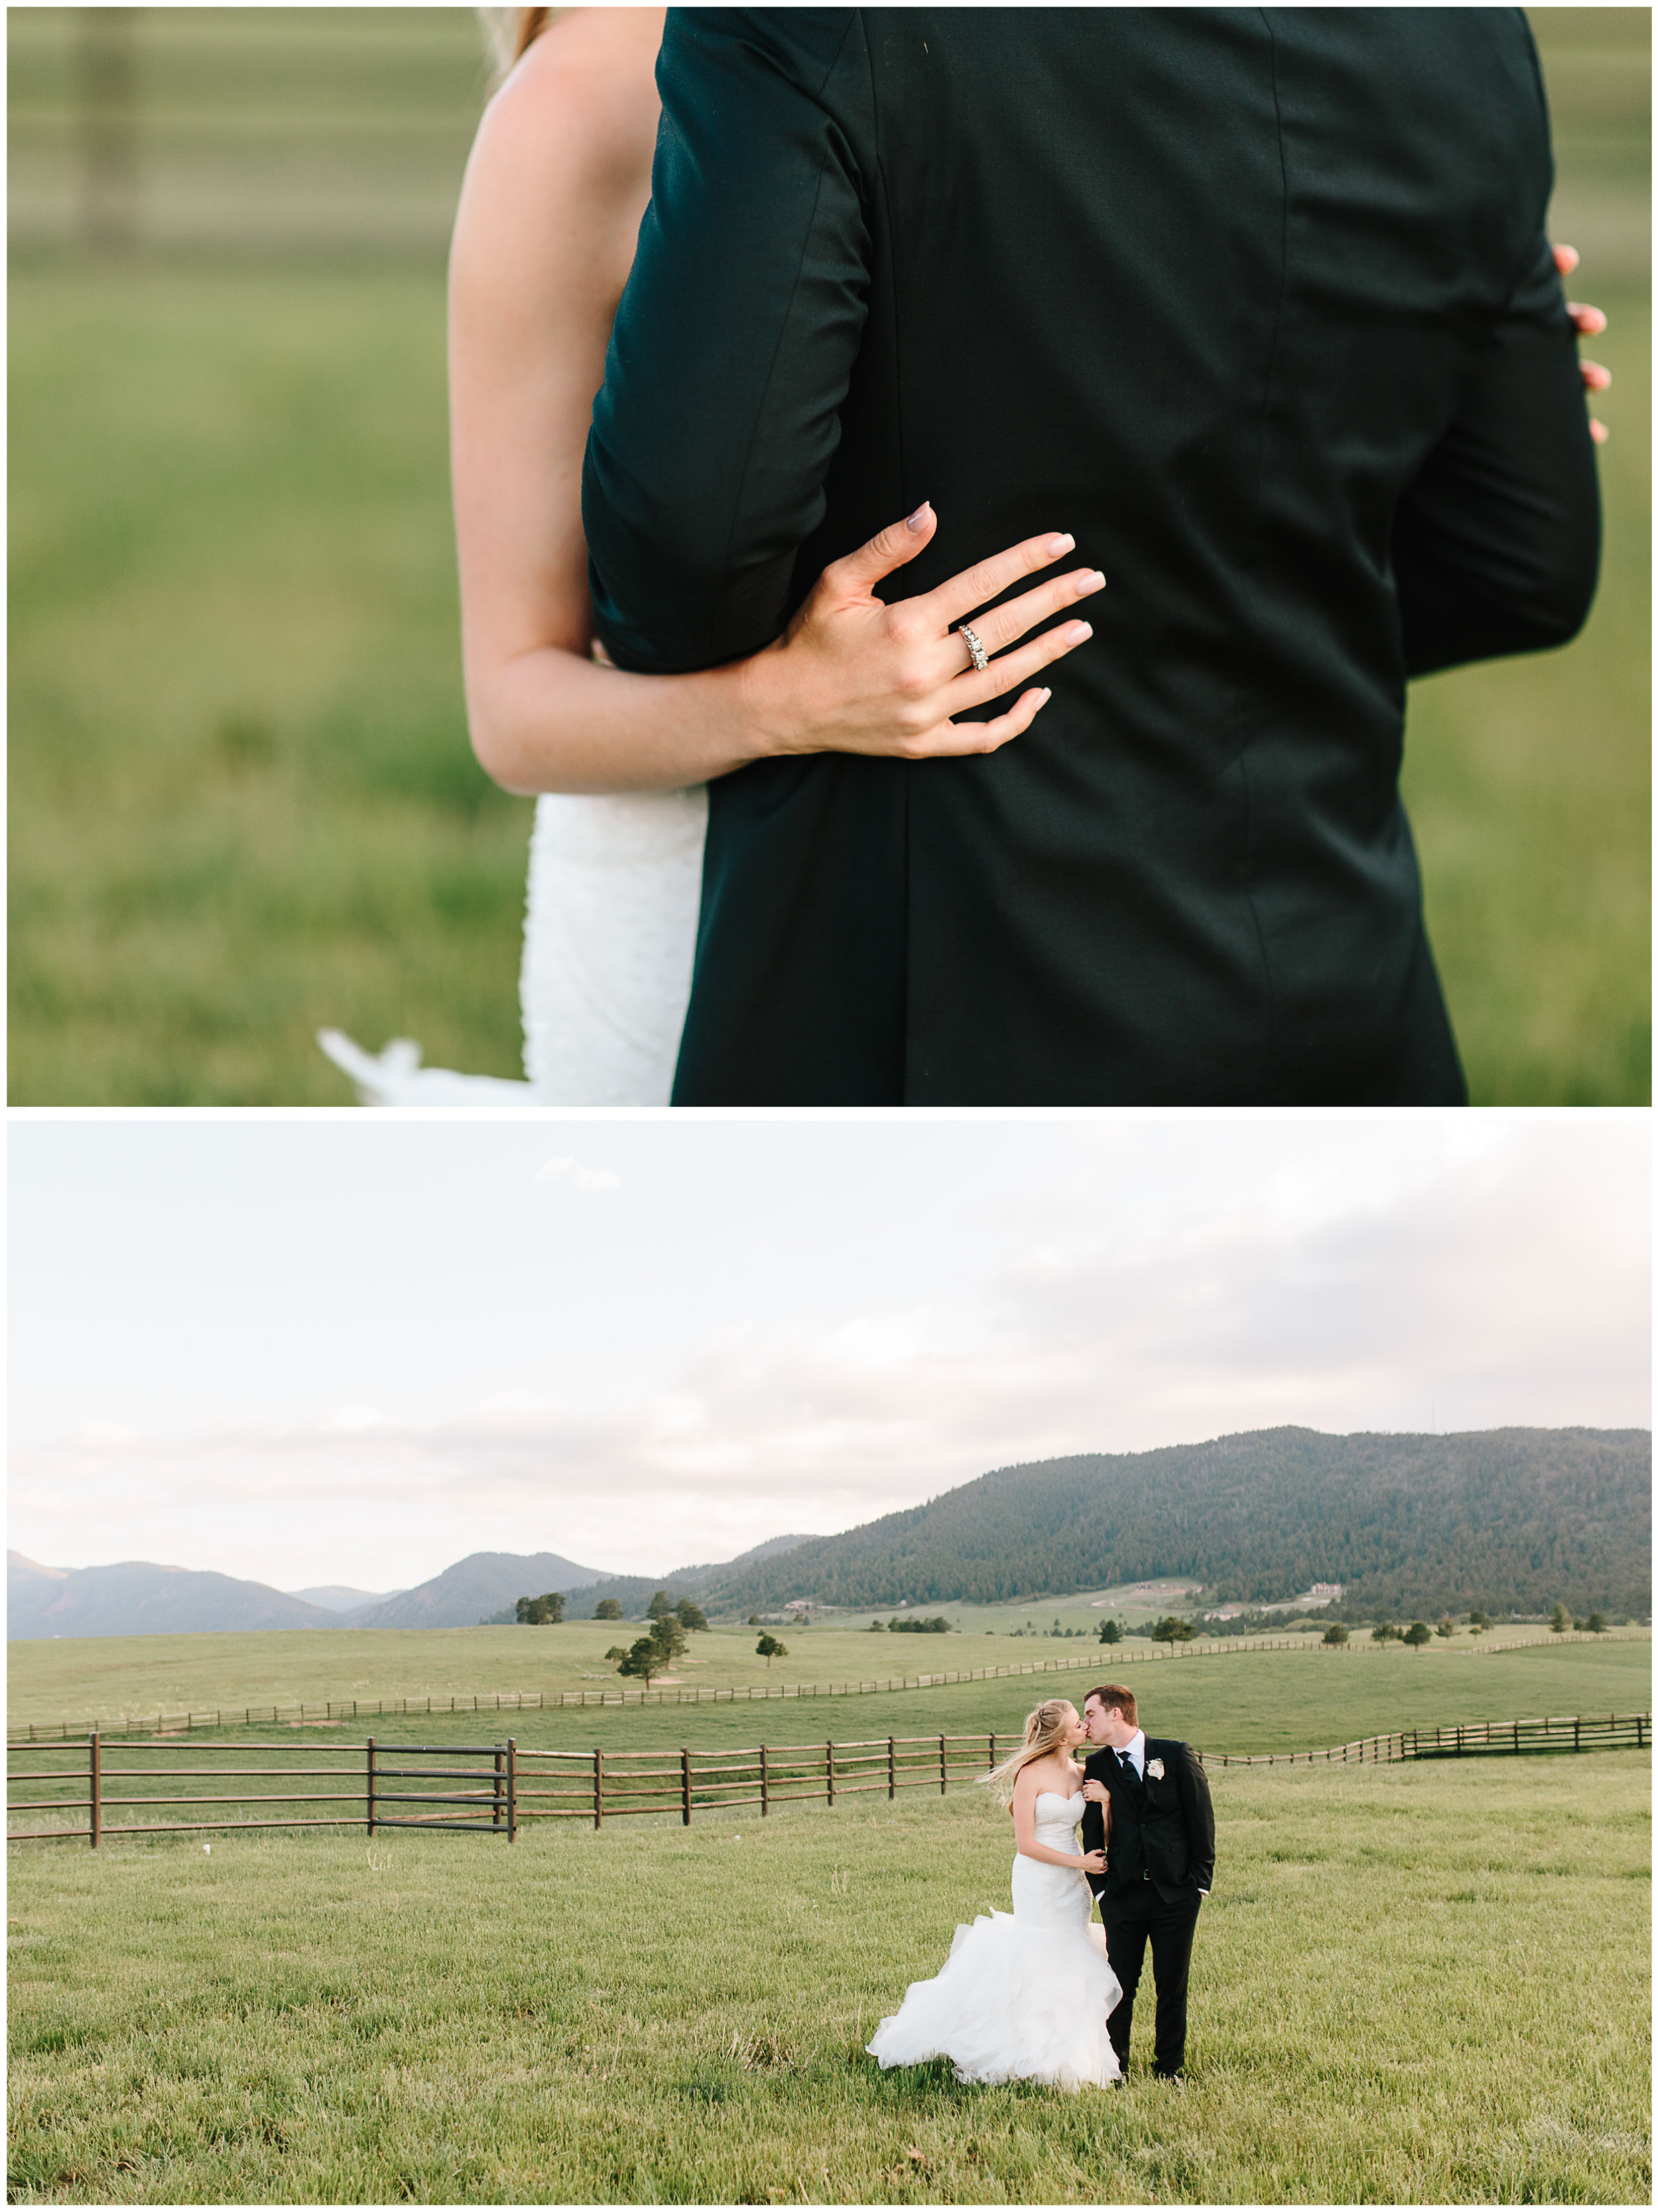 spruce_mountain_ranch_wedding_61.jpg